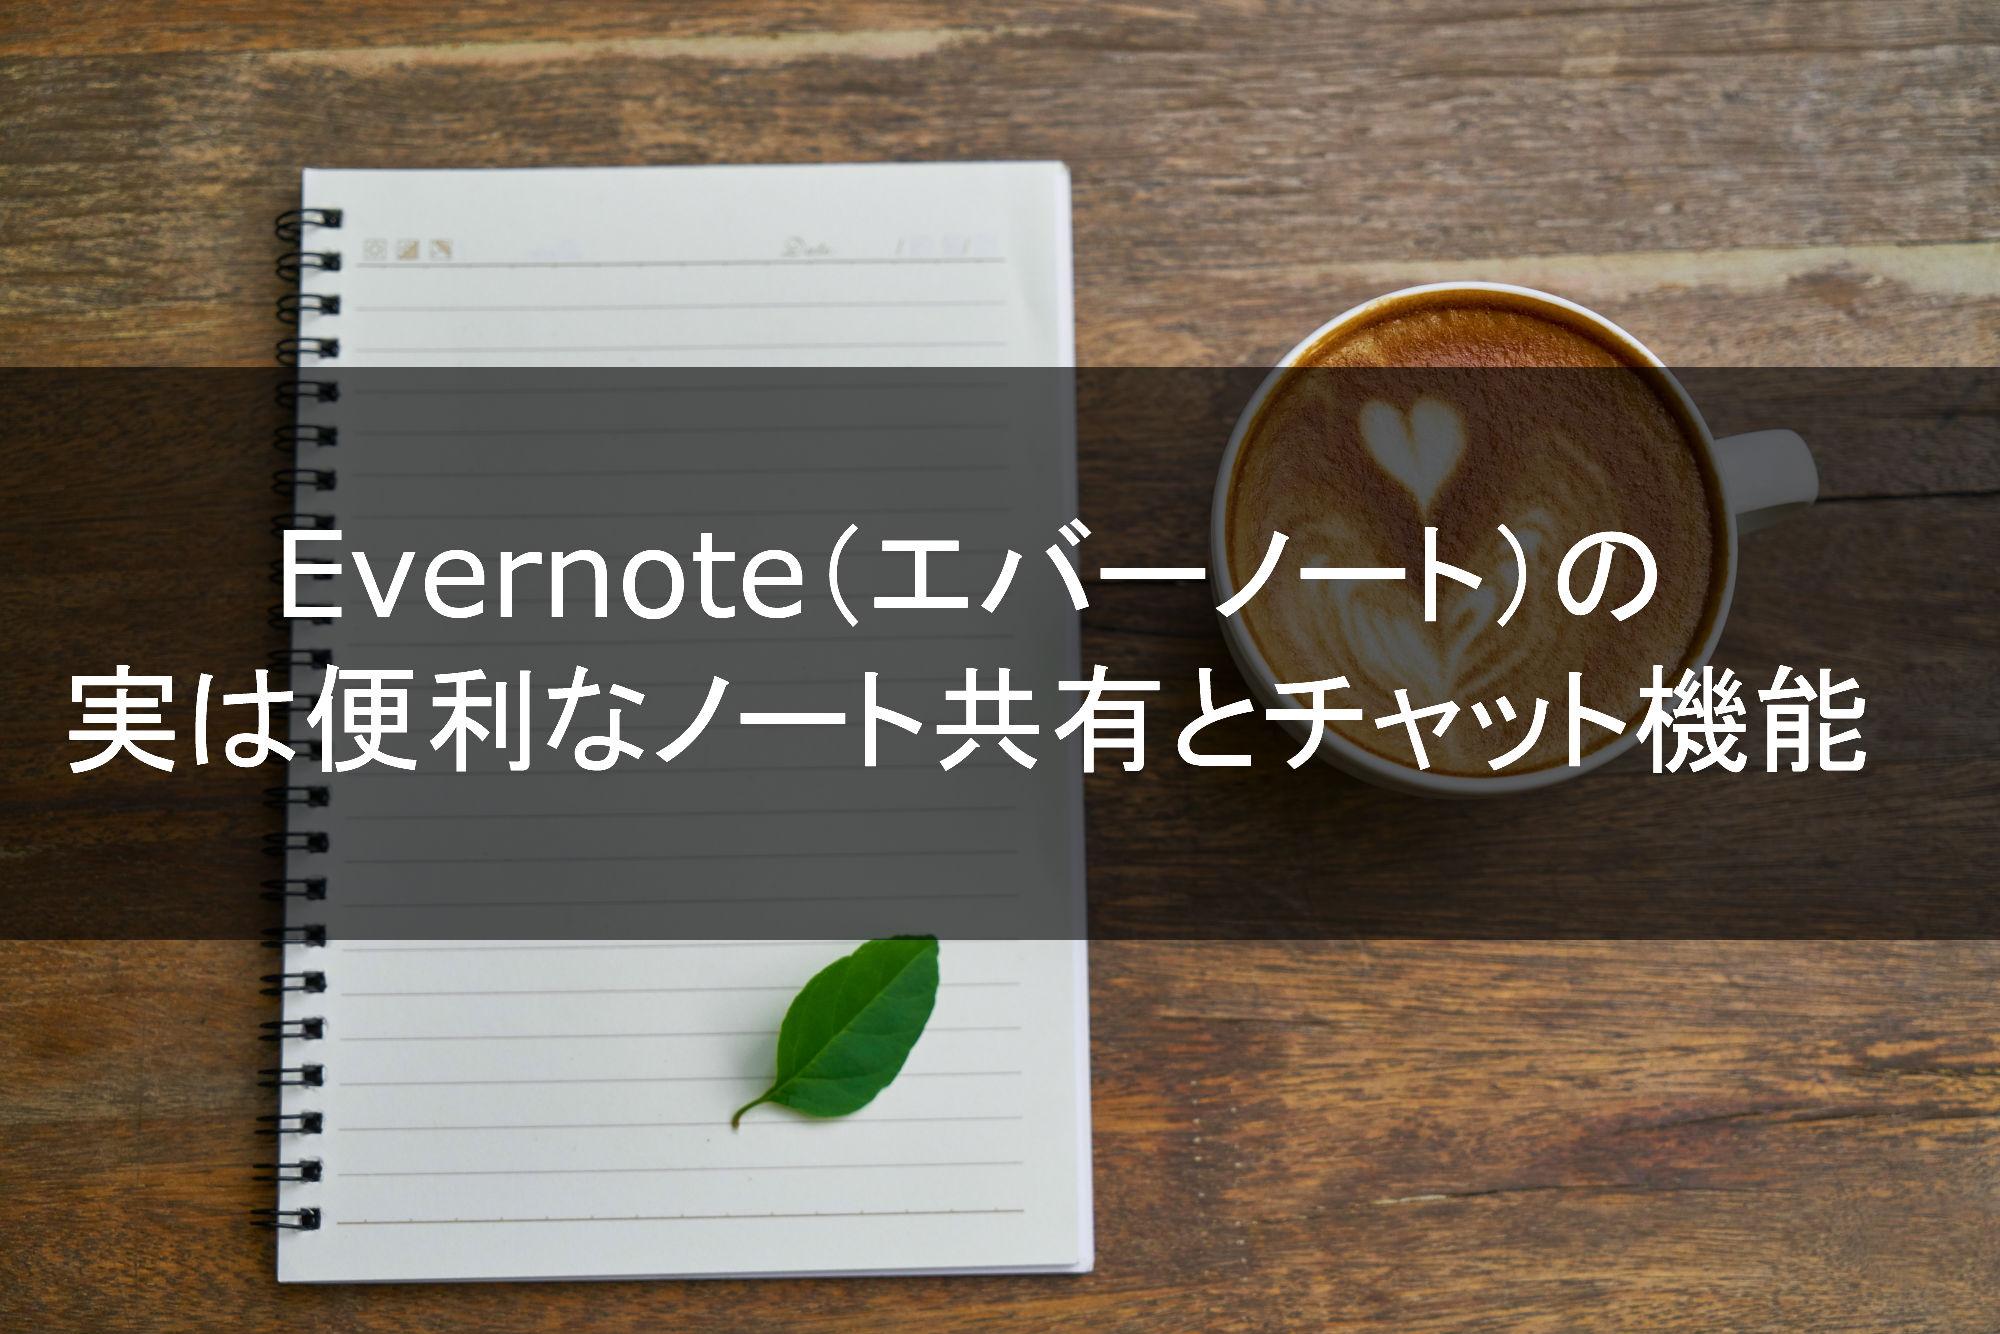 Evernote(エバーノート)の実は便利なノート共有とチャット機能